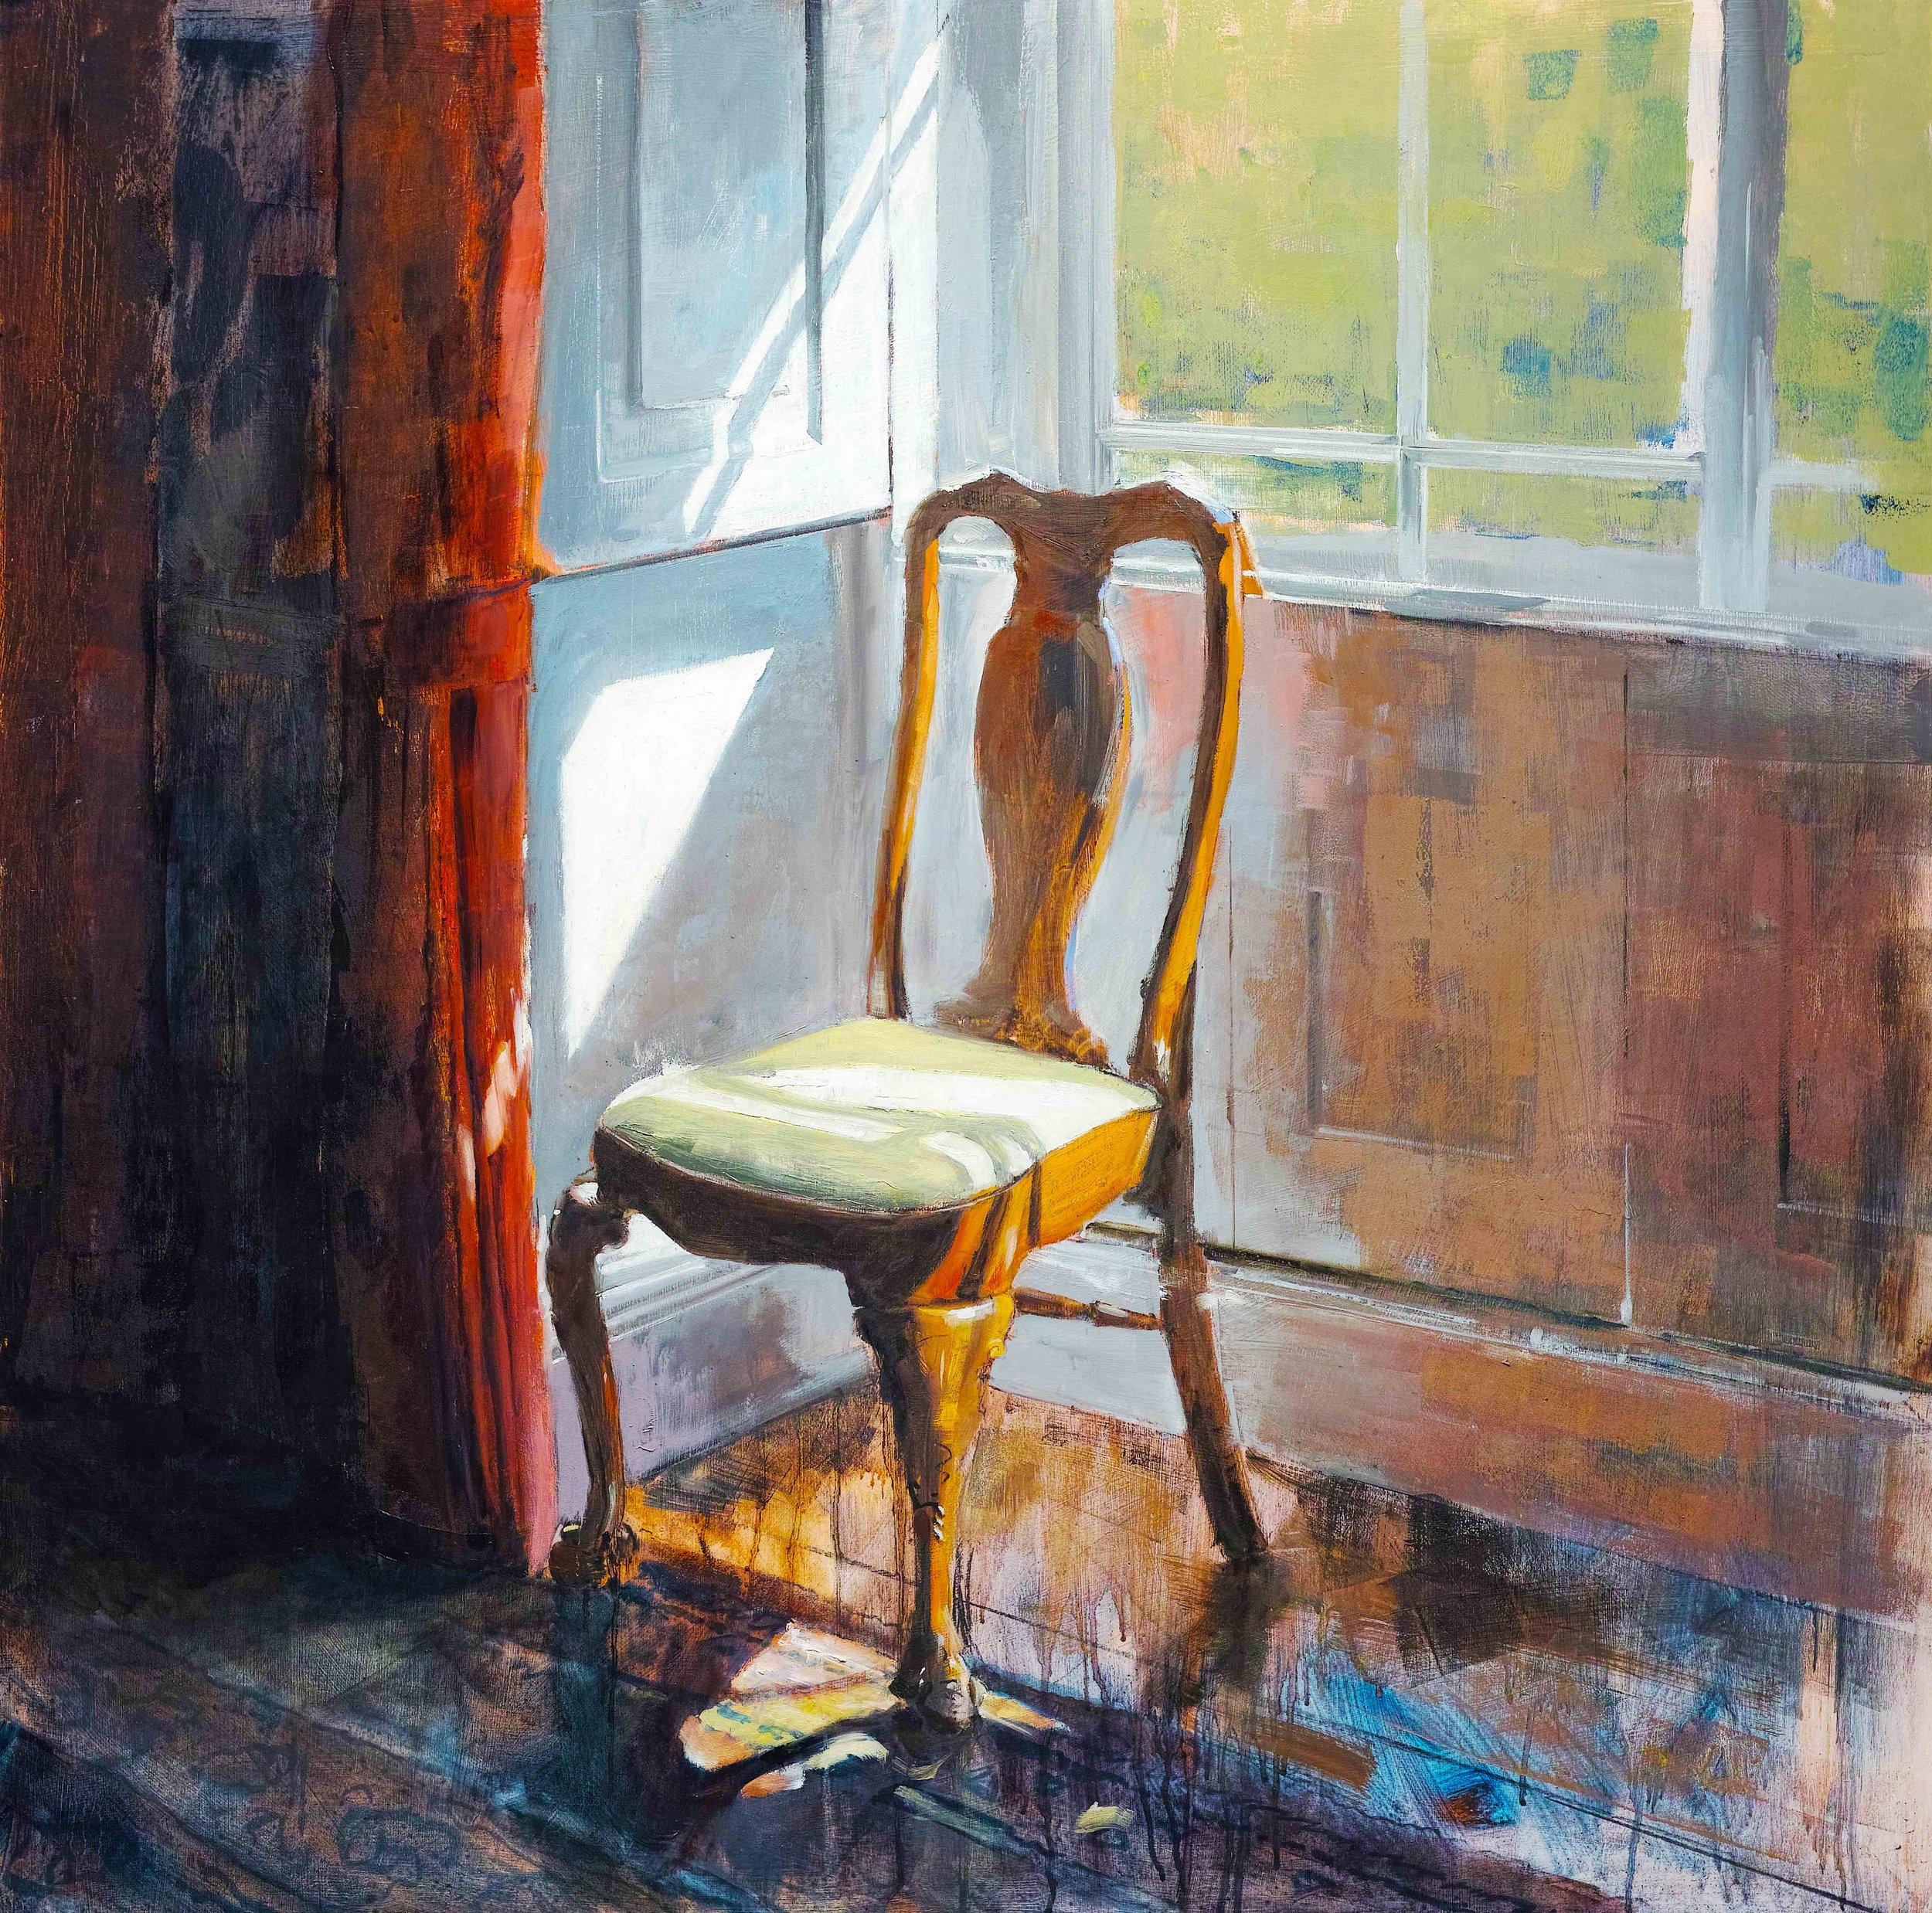 Tom Goffe